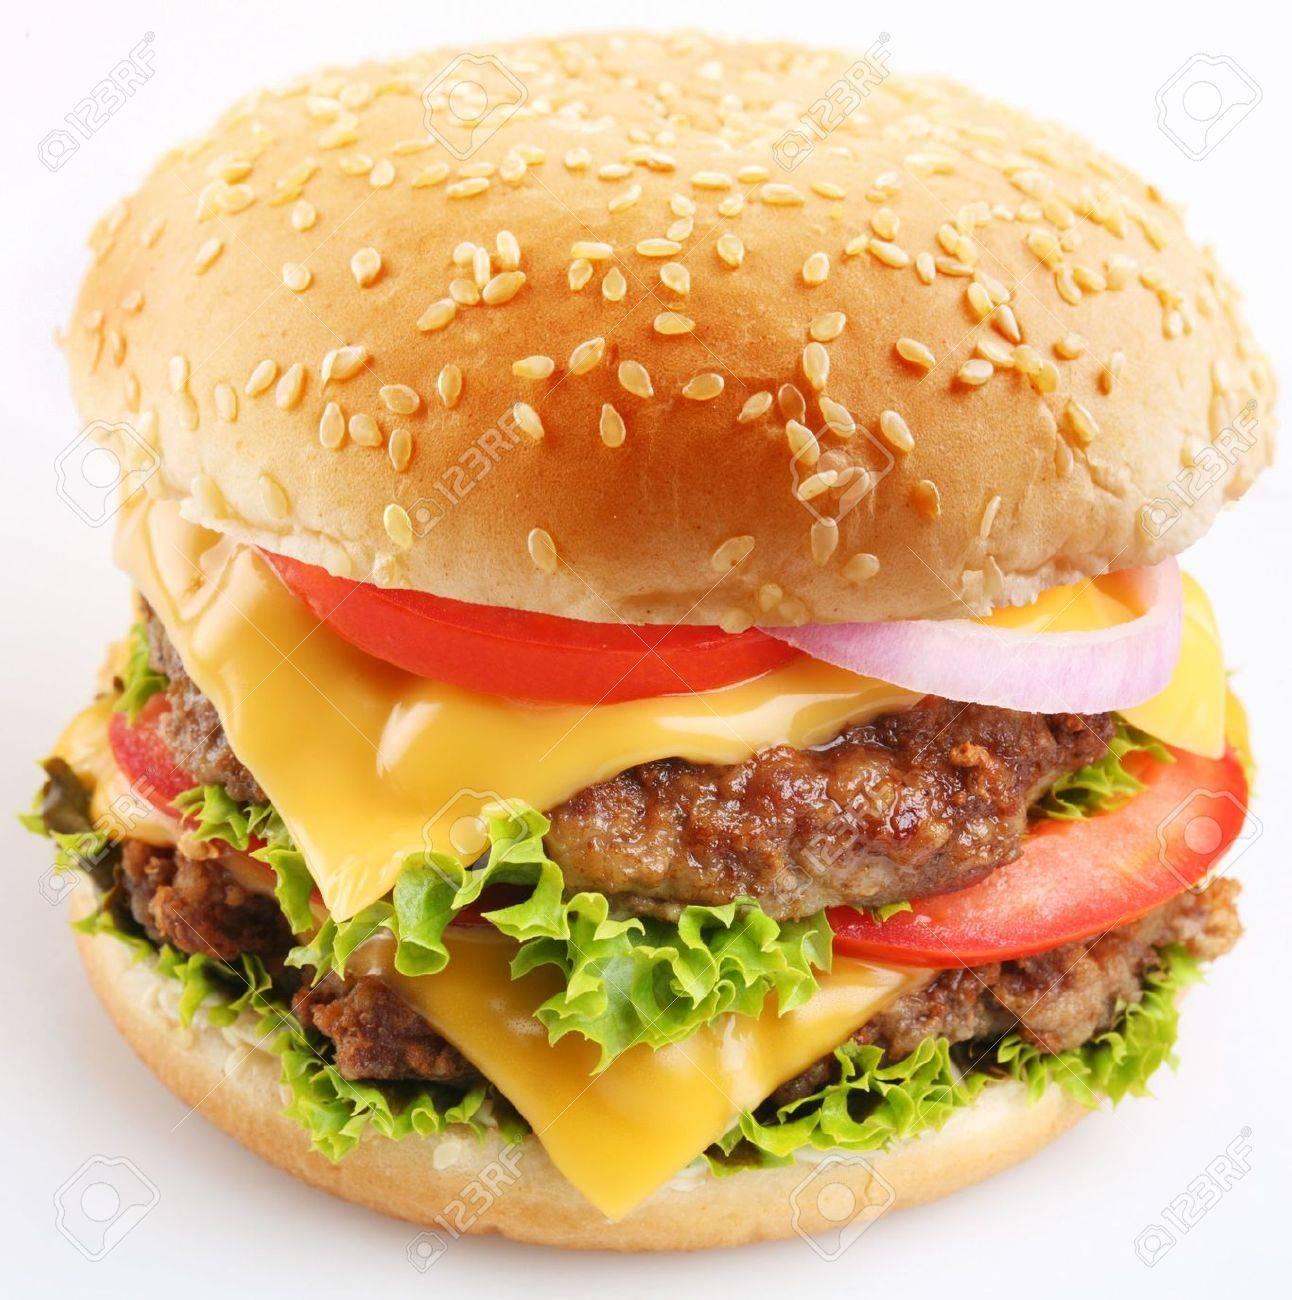 Cheeseburger on a white background Stock Photo - 6305922